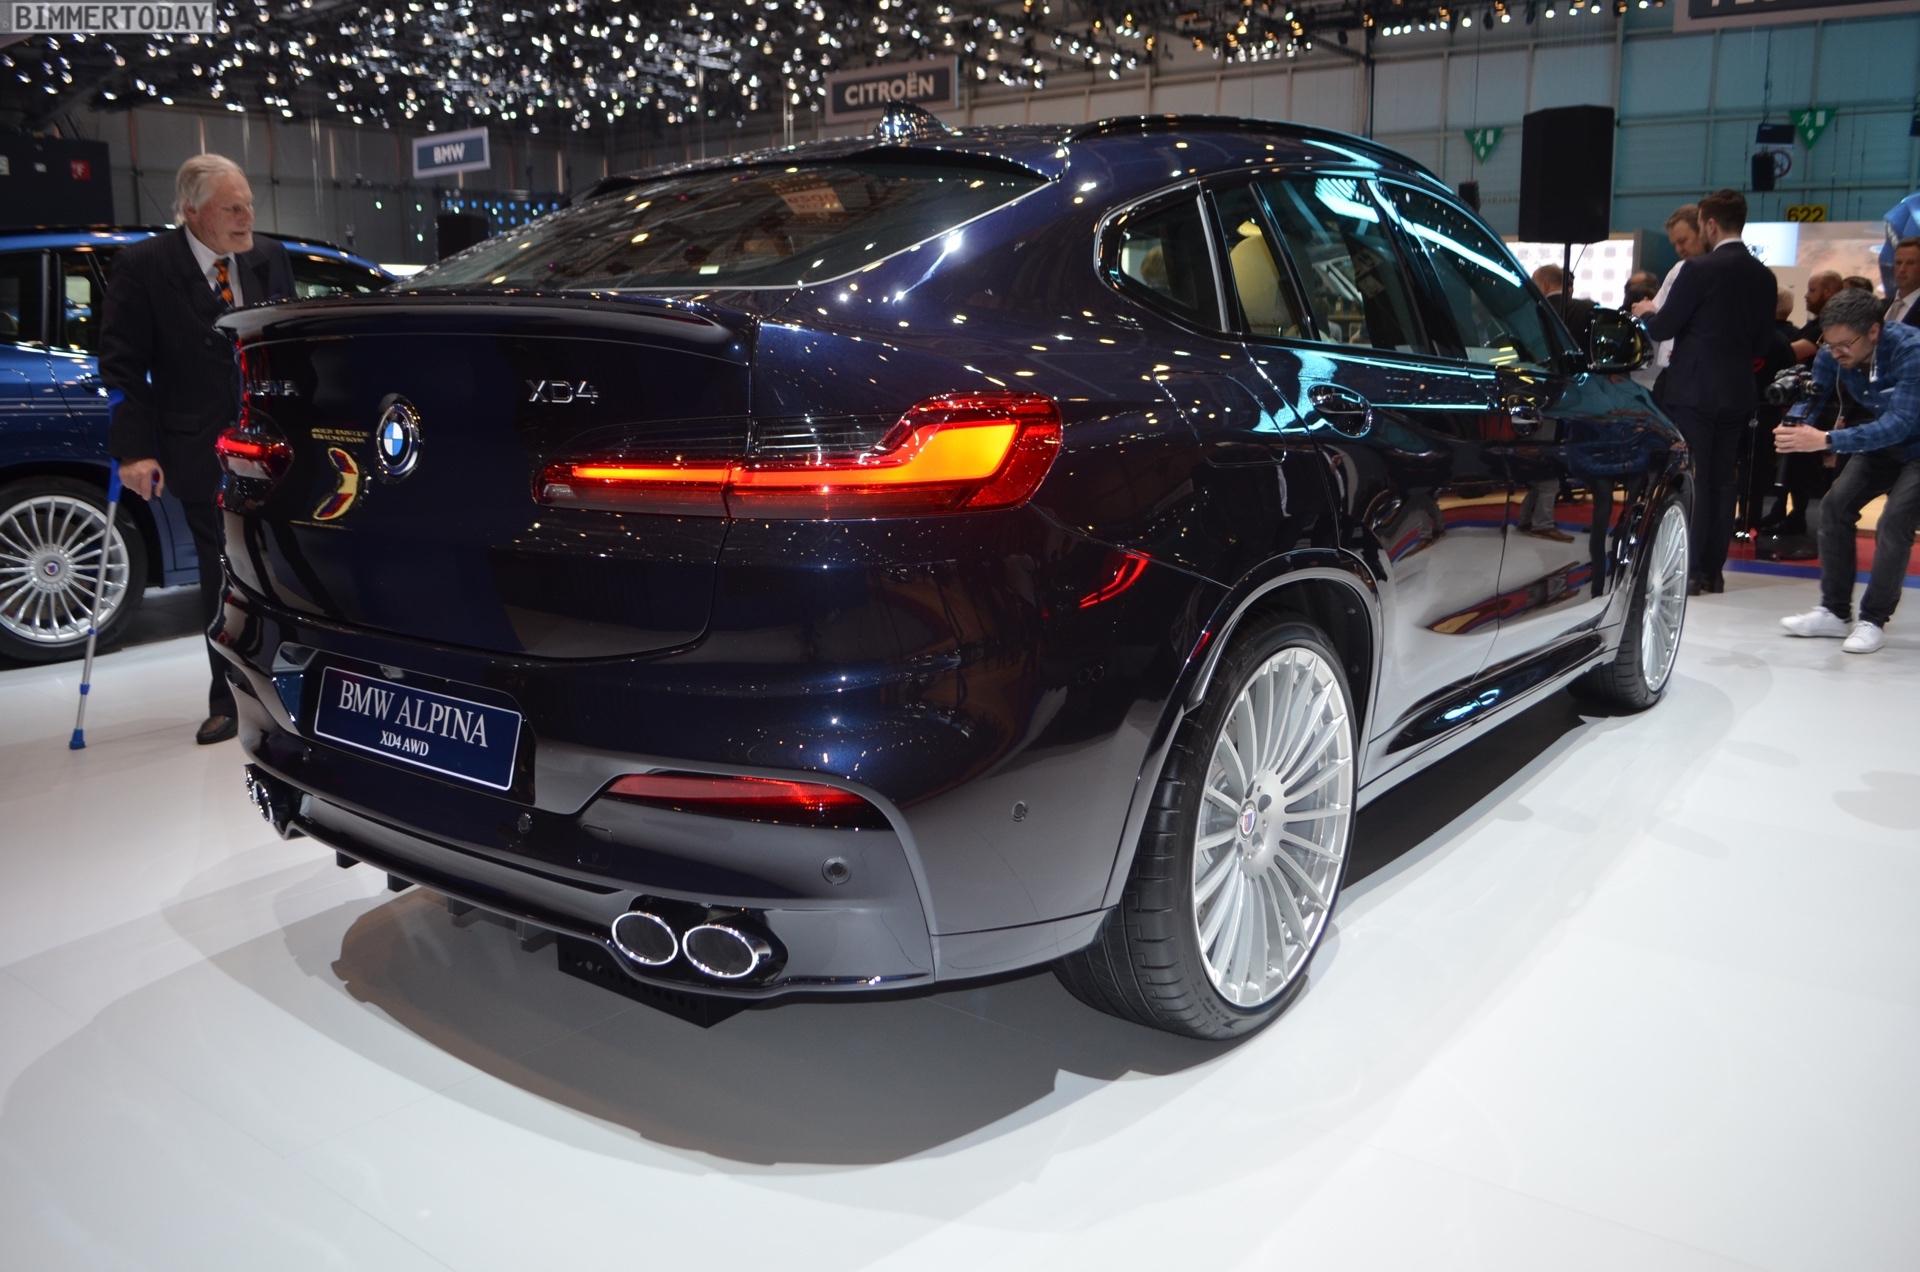 BMW Alpina XD4 al Salone di Ginevra 2018 - BMWnews